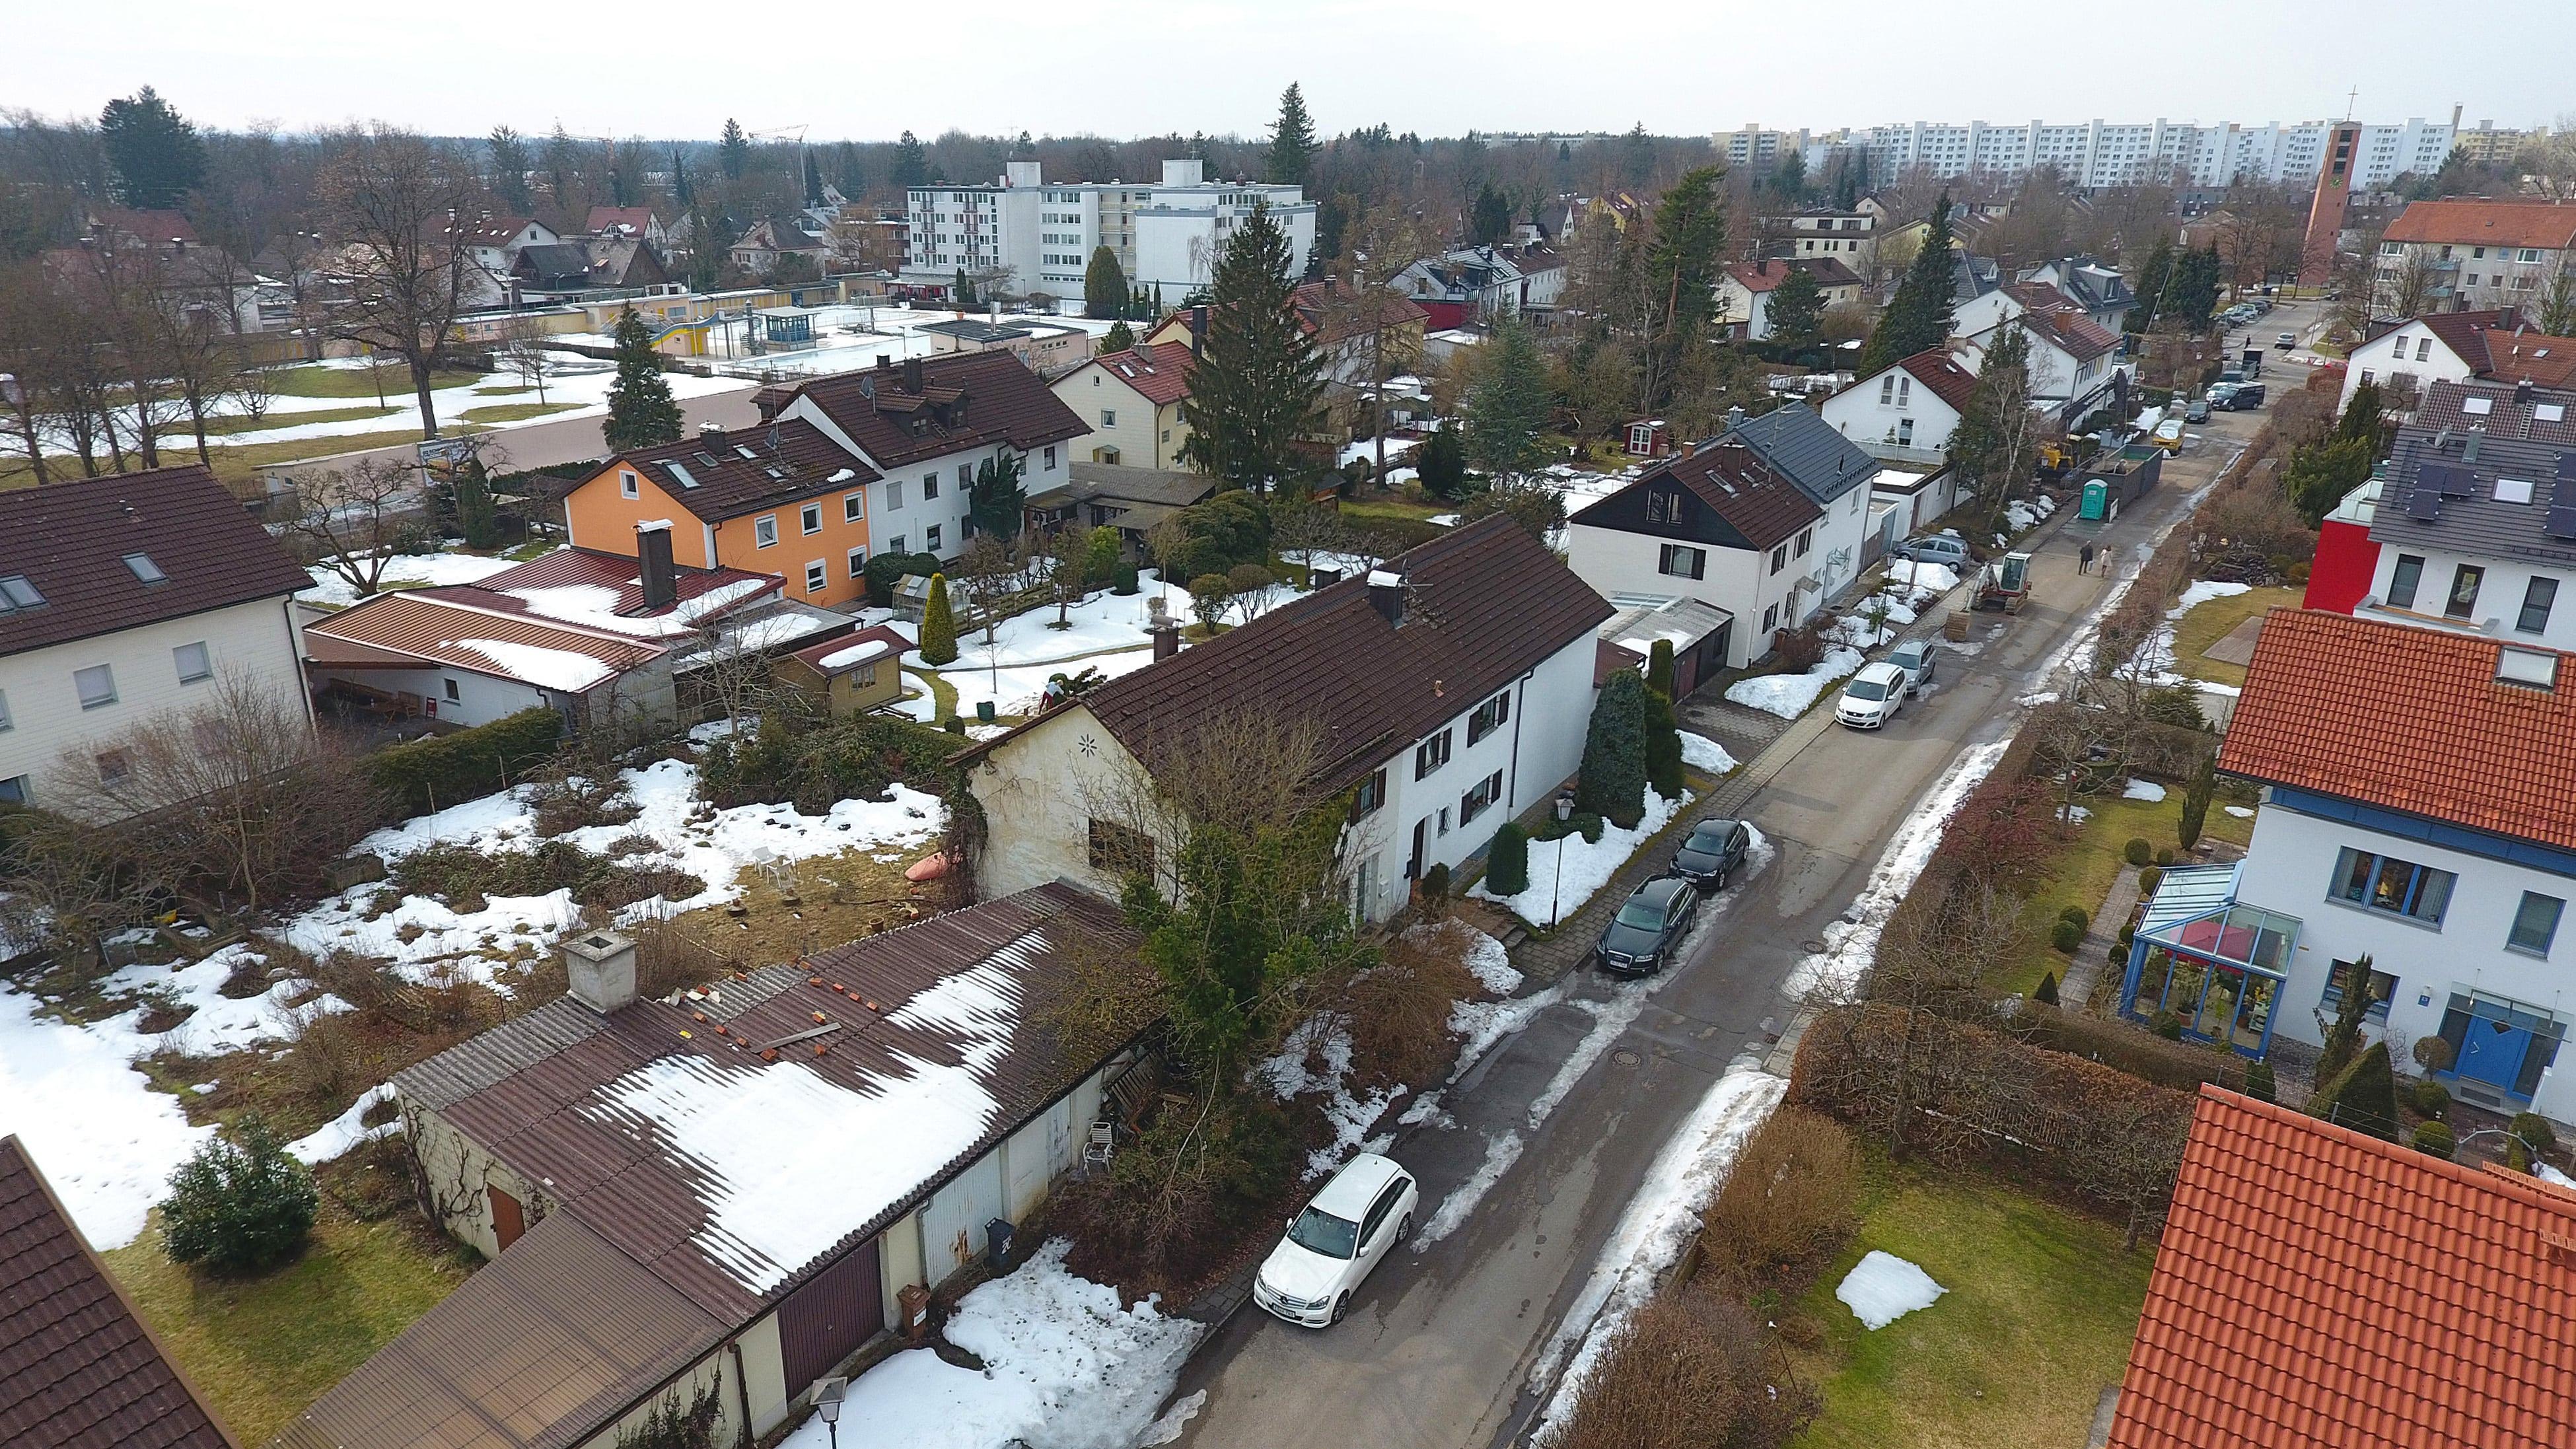 johannsebastianbachstrasse20-0219Blank011-min